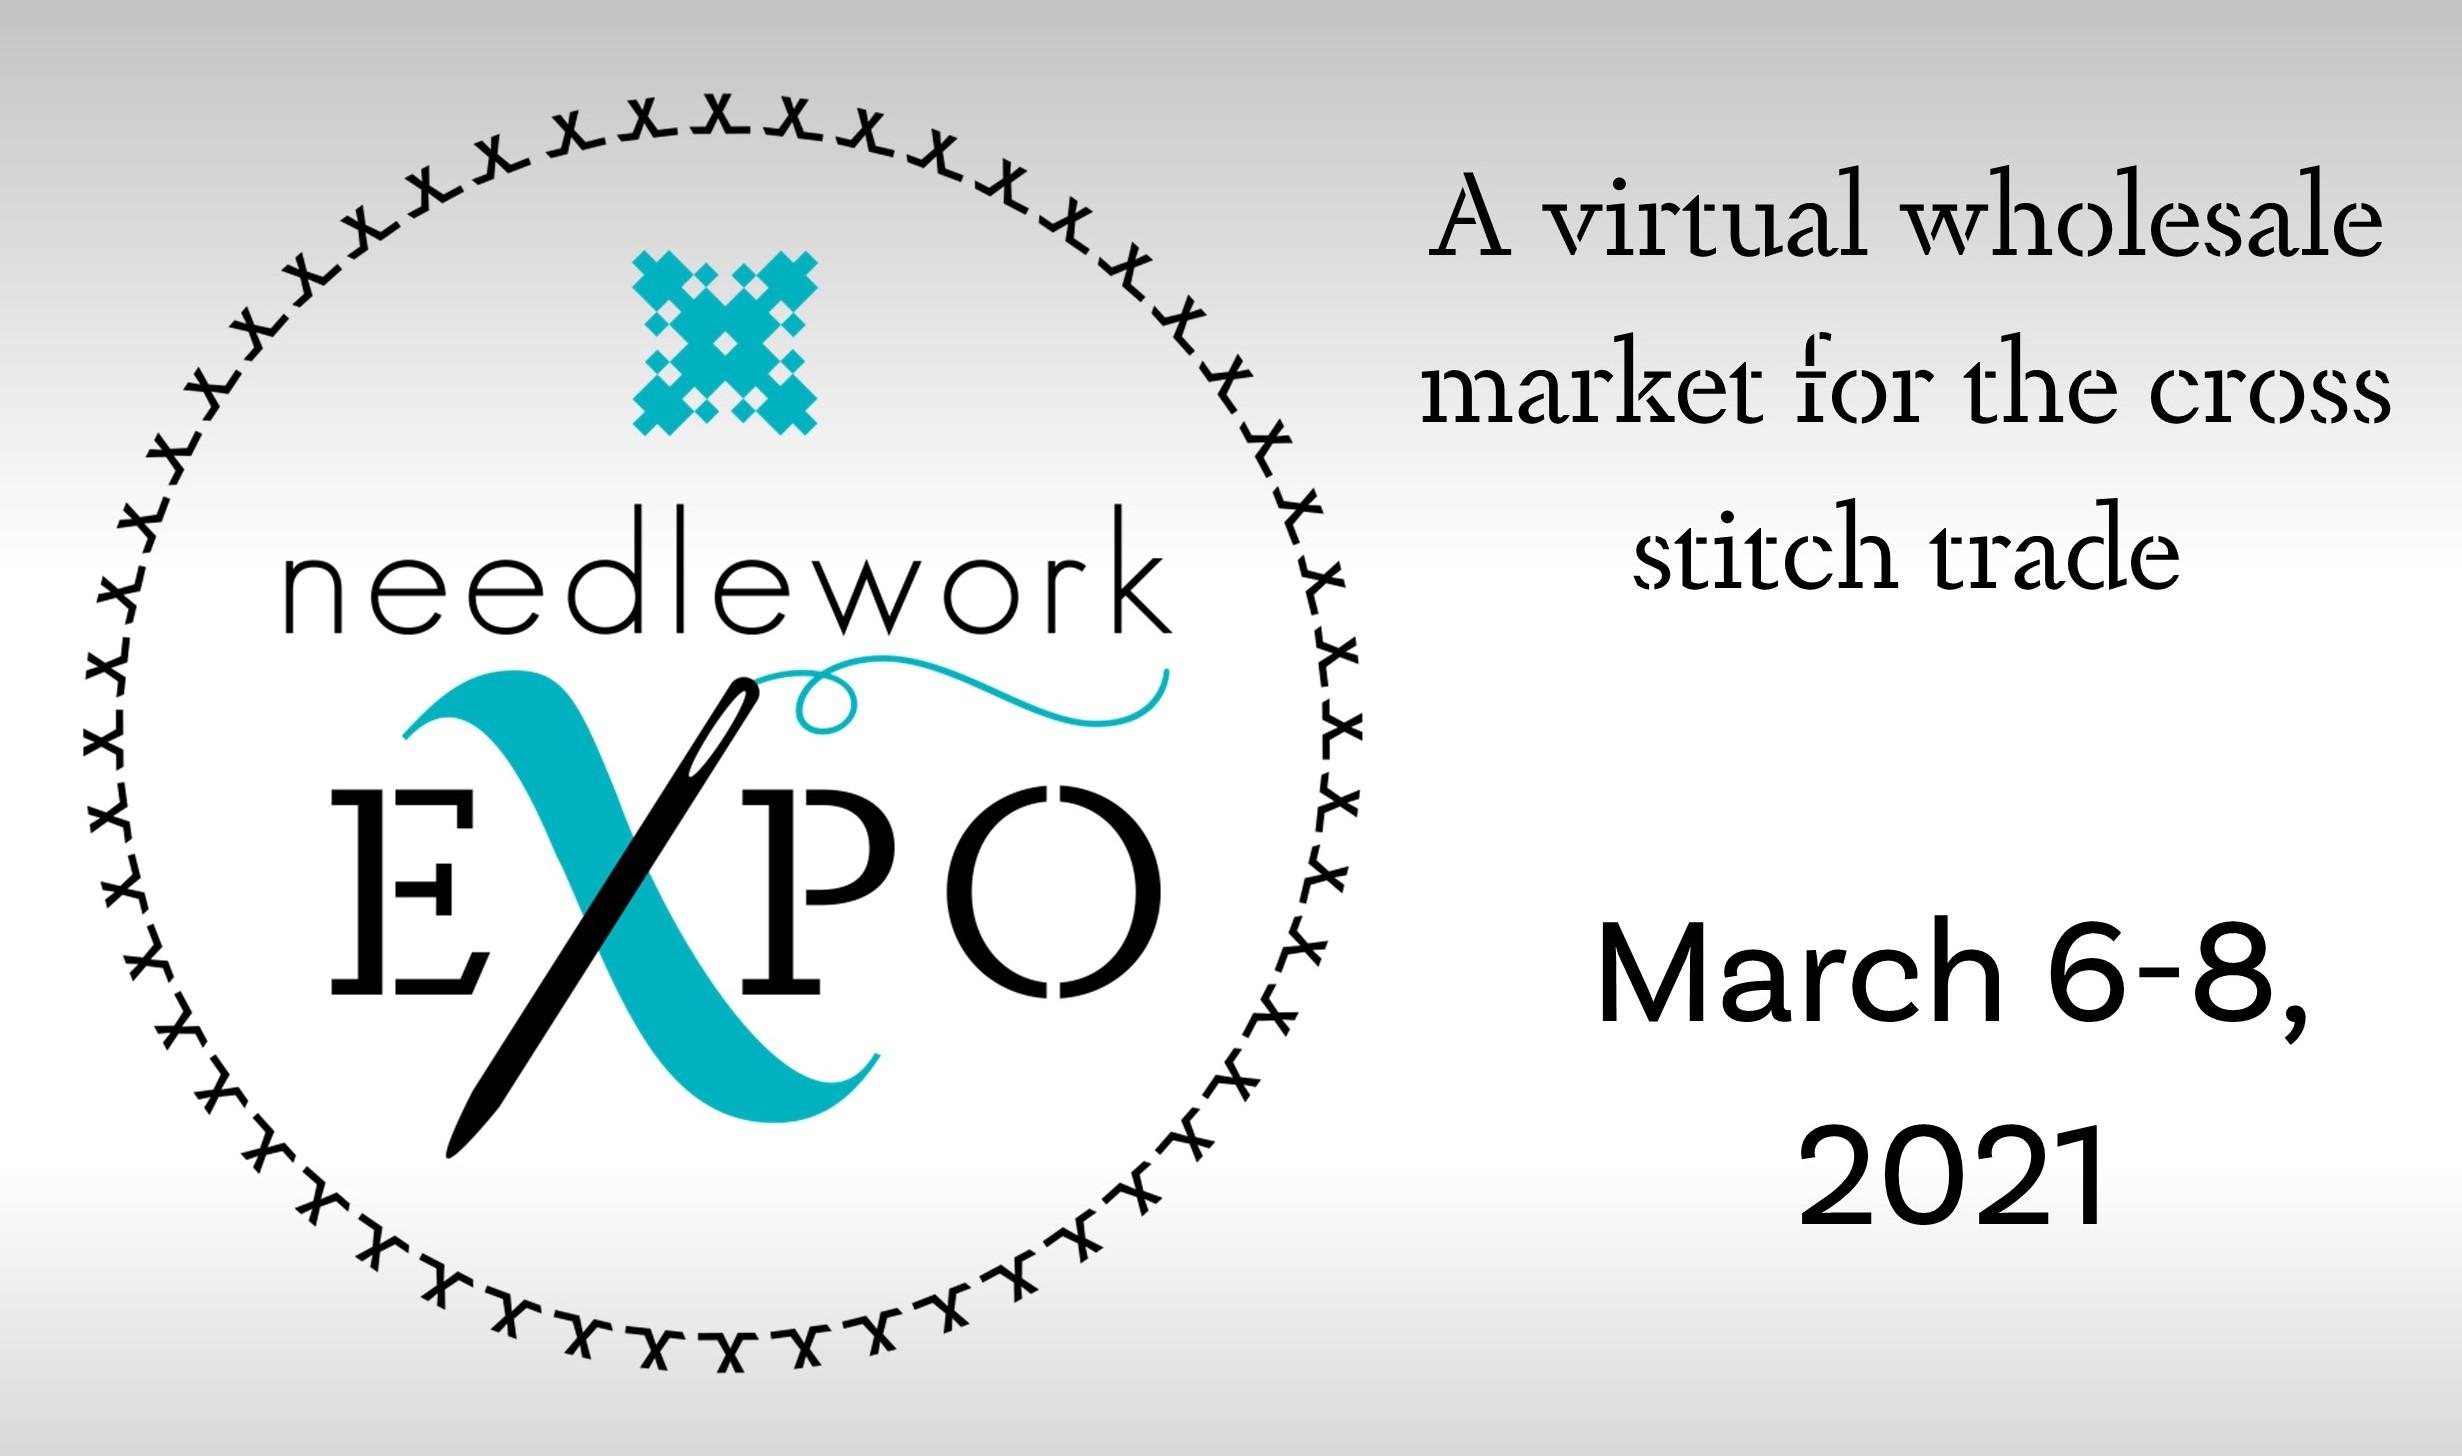 needlework expo virtual wholesale market for cross stitch trade 2021